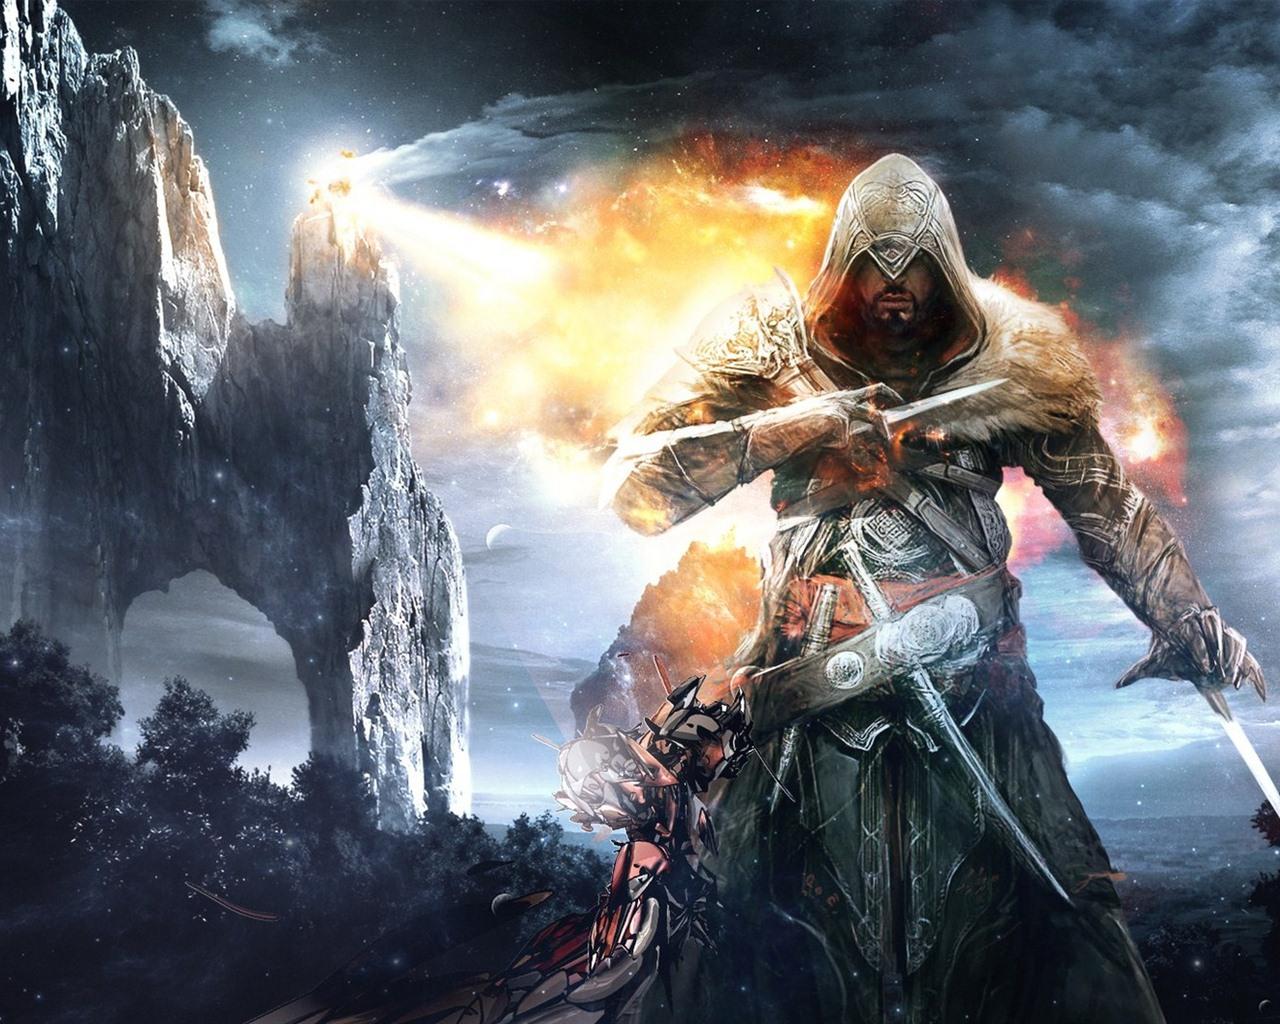 Assassins Creed Revelations HD wallpapers 11   1280x1024 Wallpaper 1280x1024